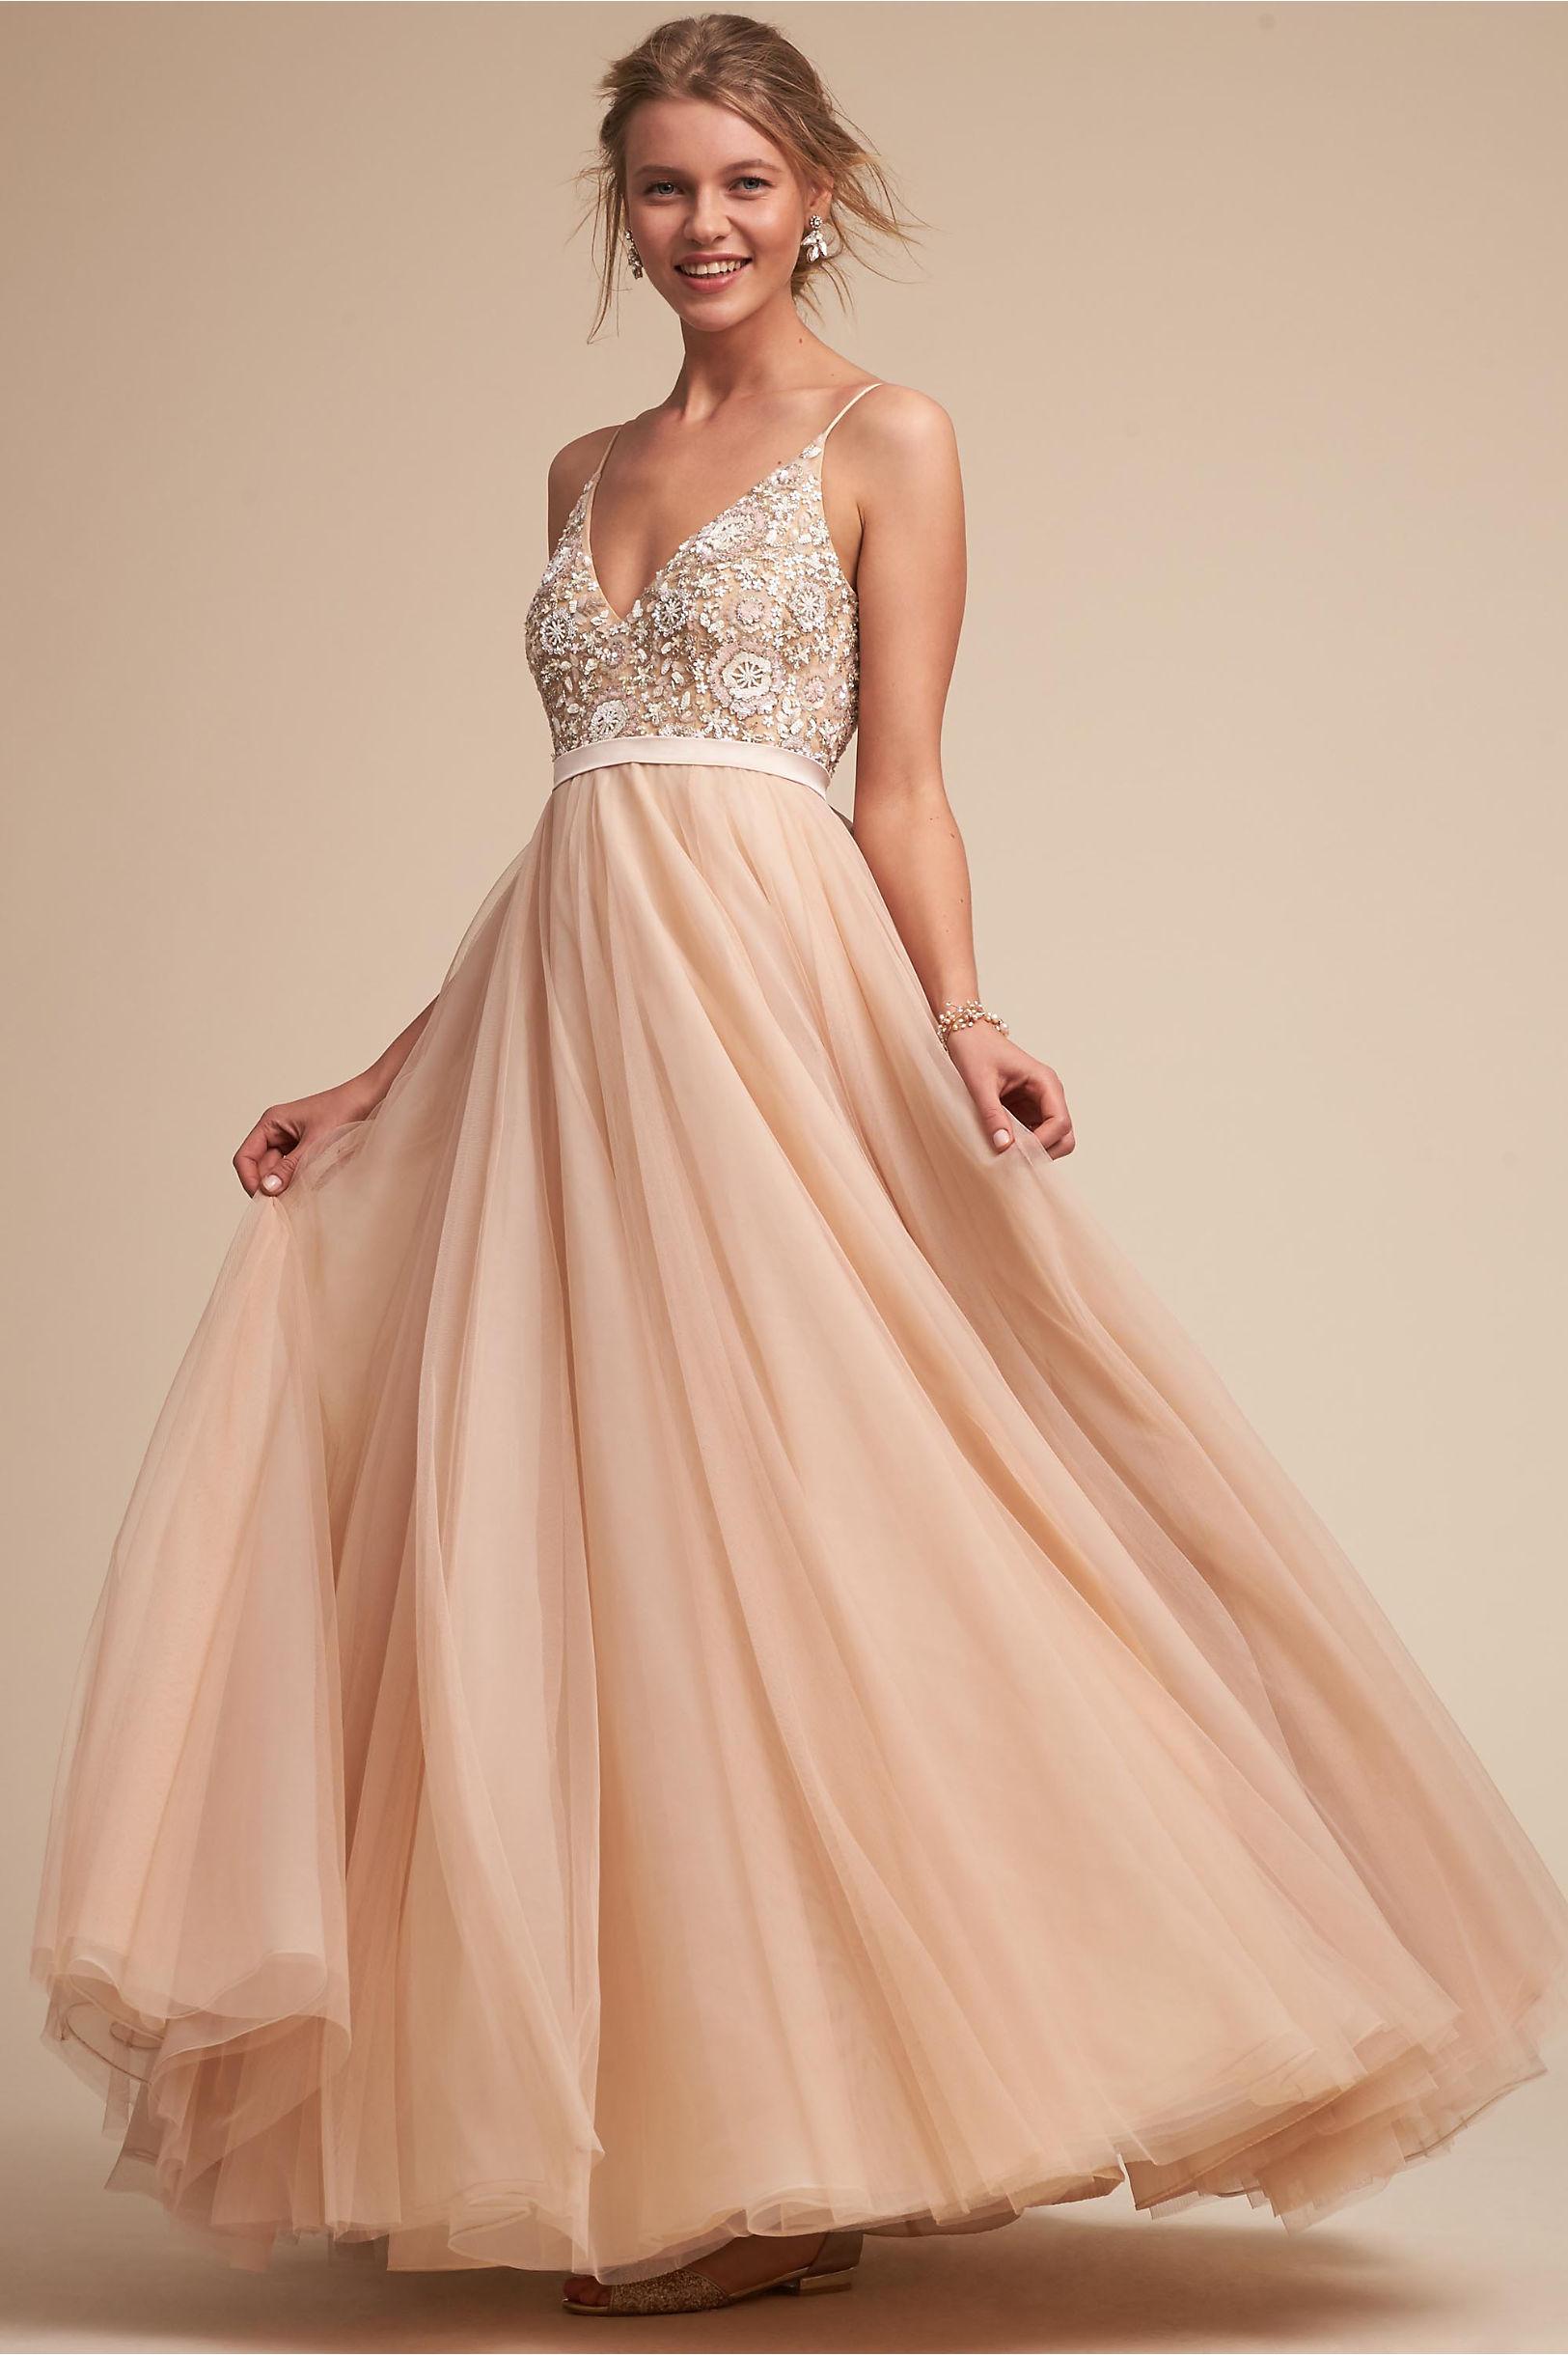 Benson Gown in Sale   BHLDN